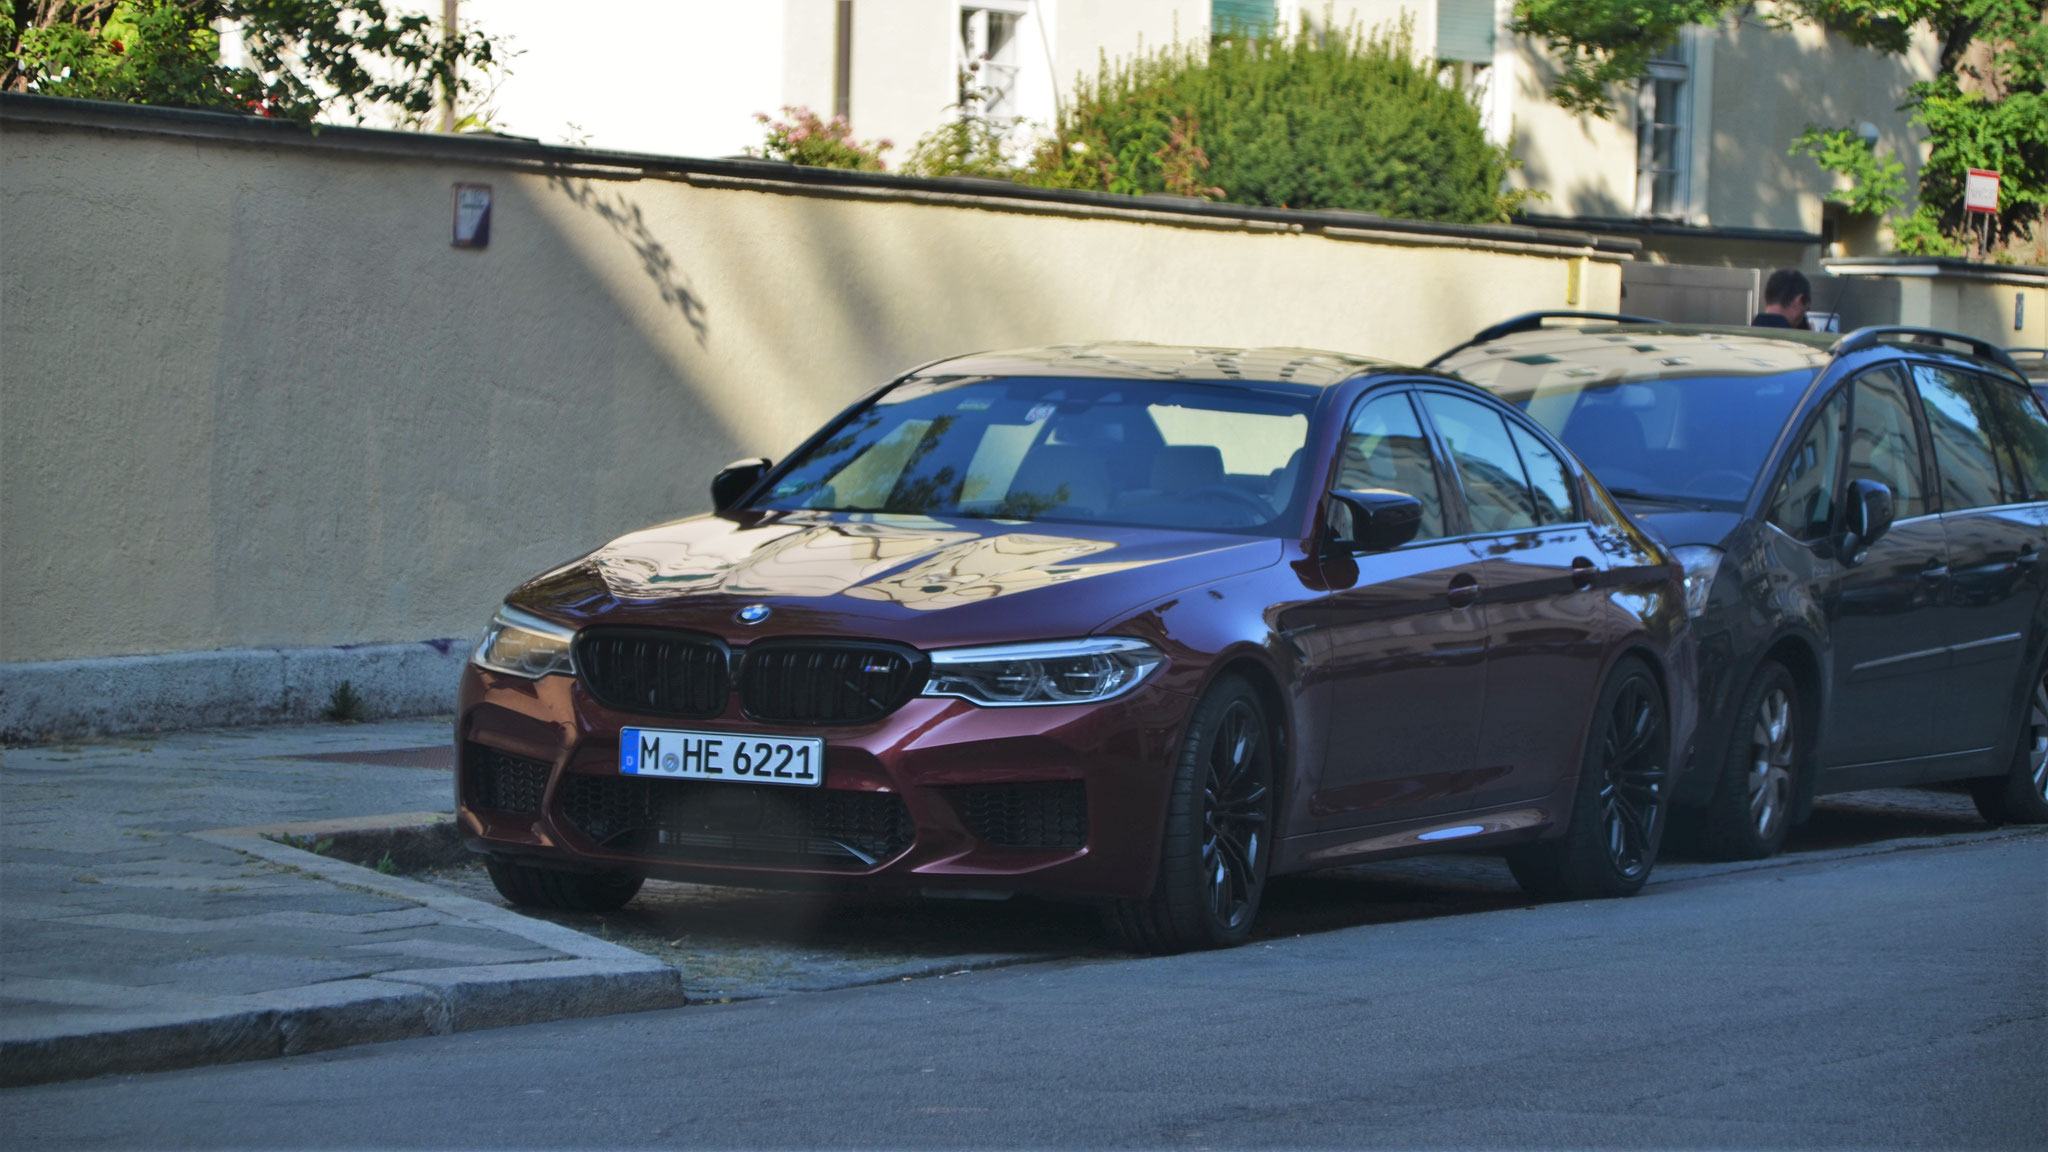 BMW M5 - M-HE-6221